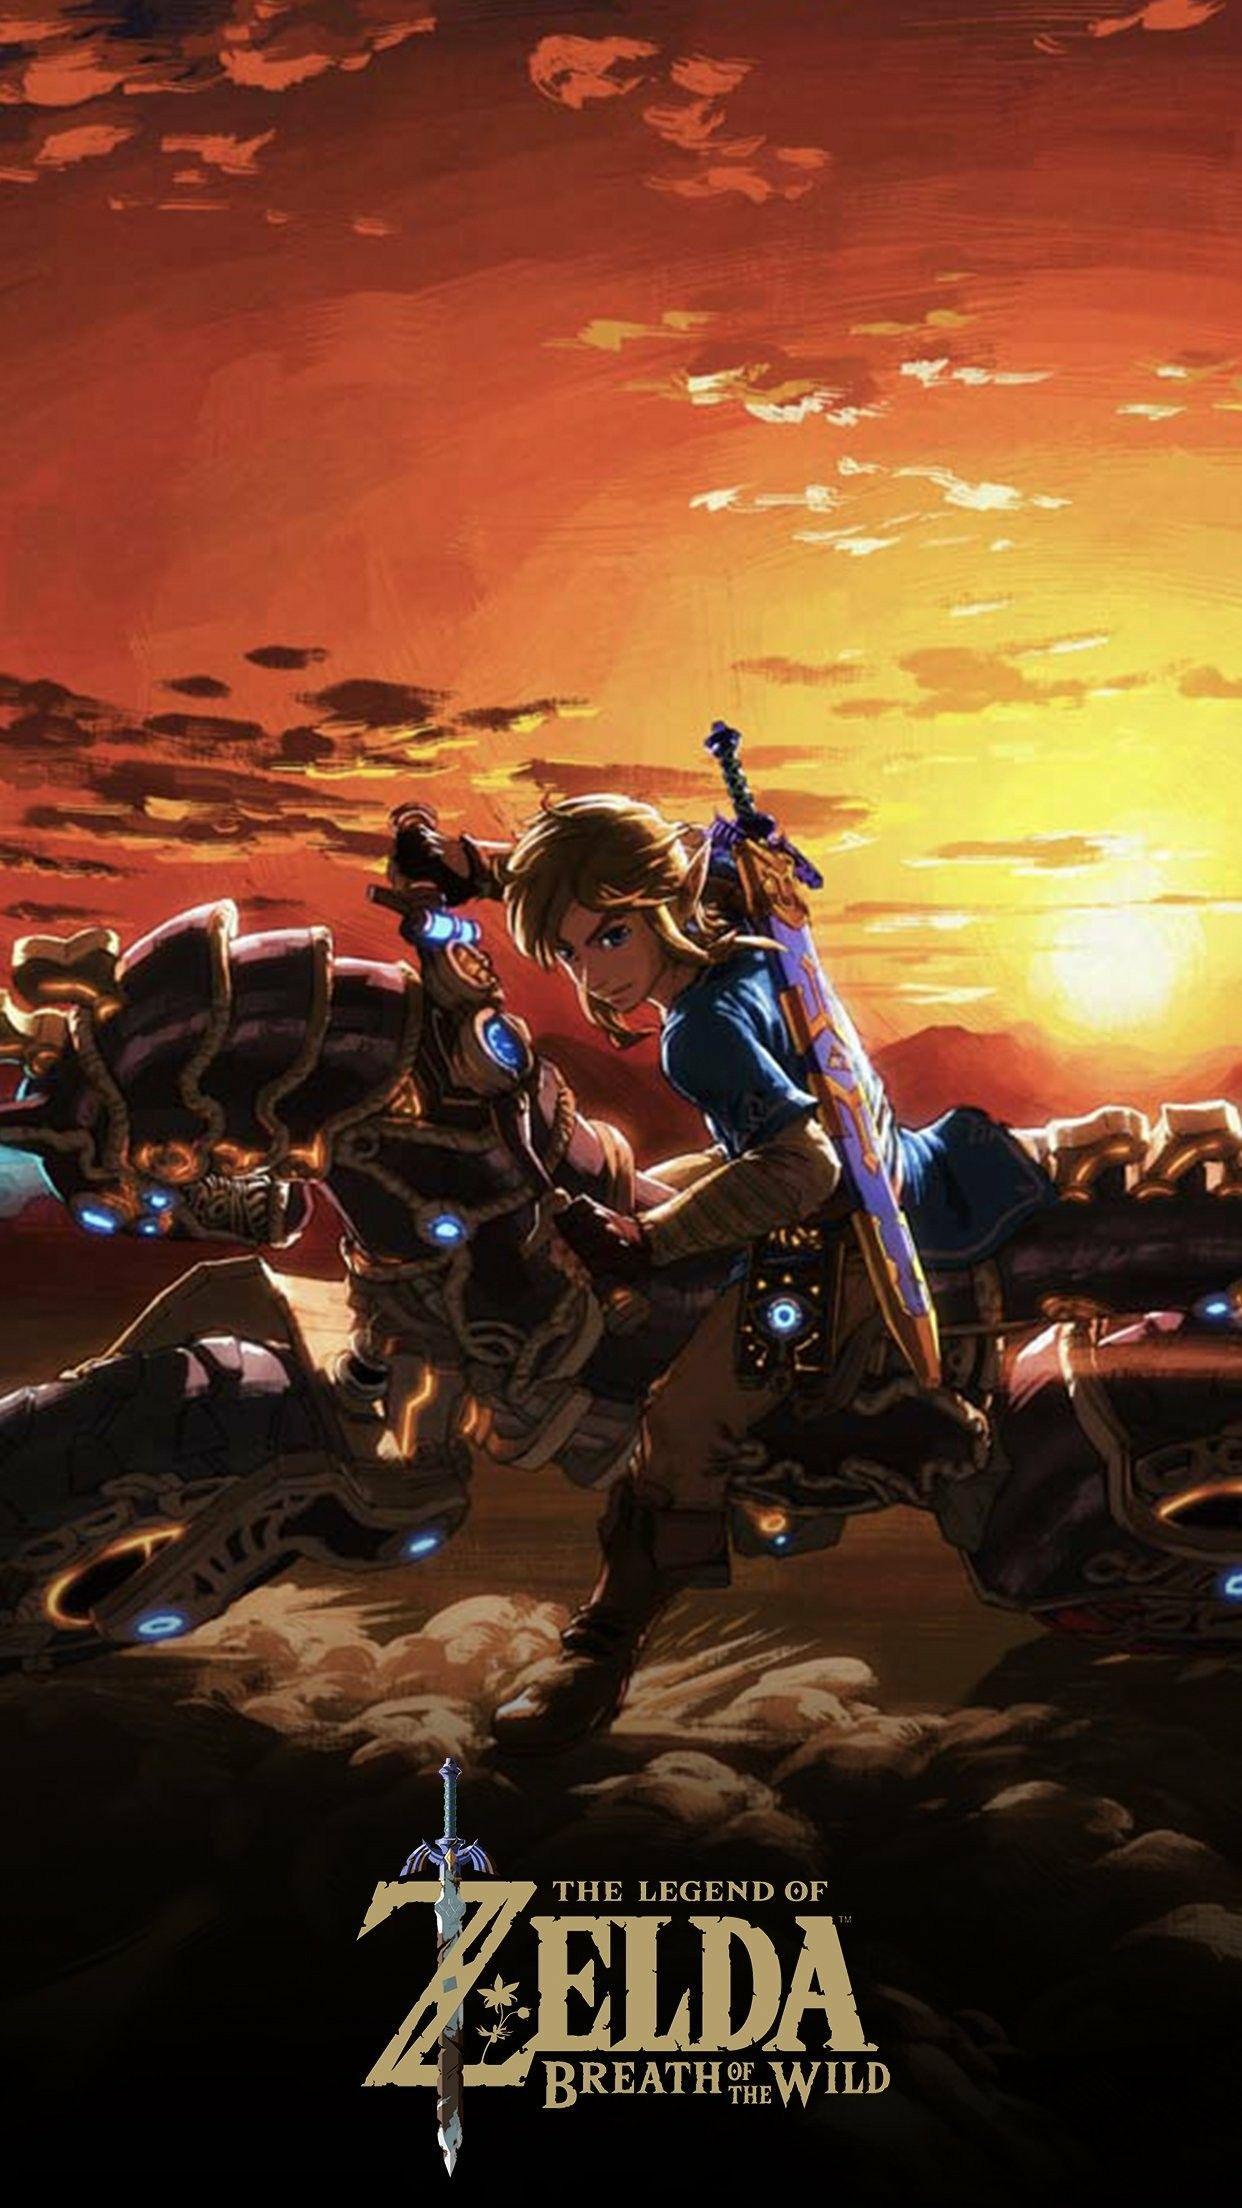 Legend of Zelda breath of the wild mobile wallpaper from